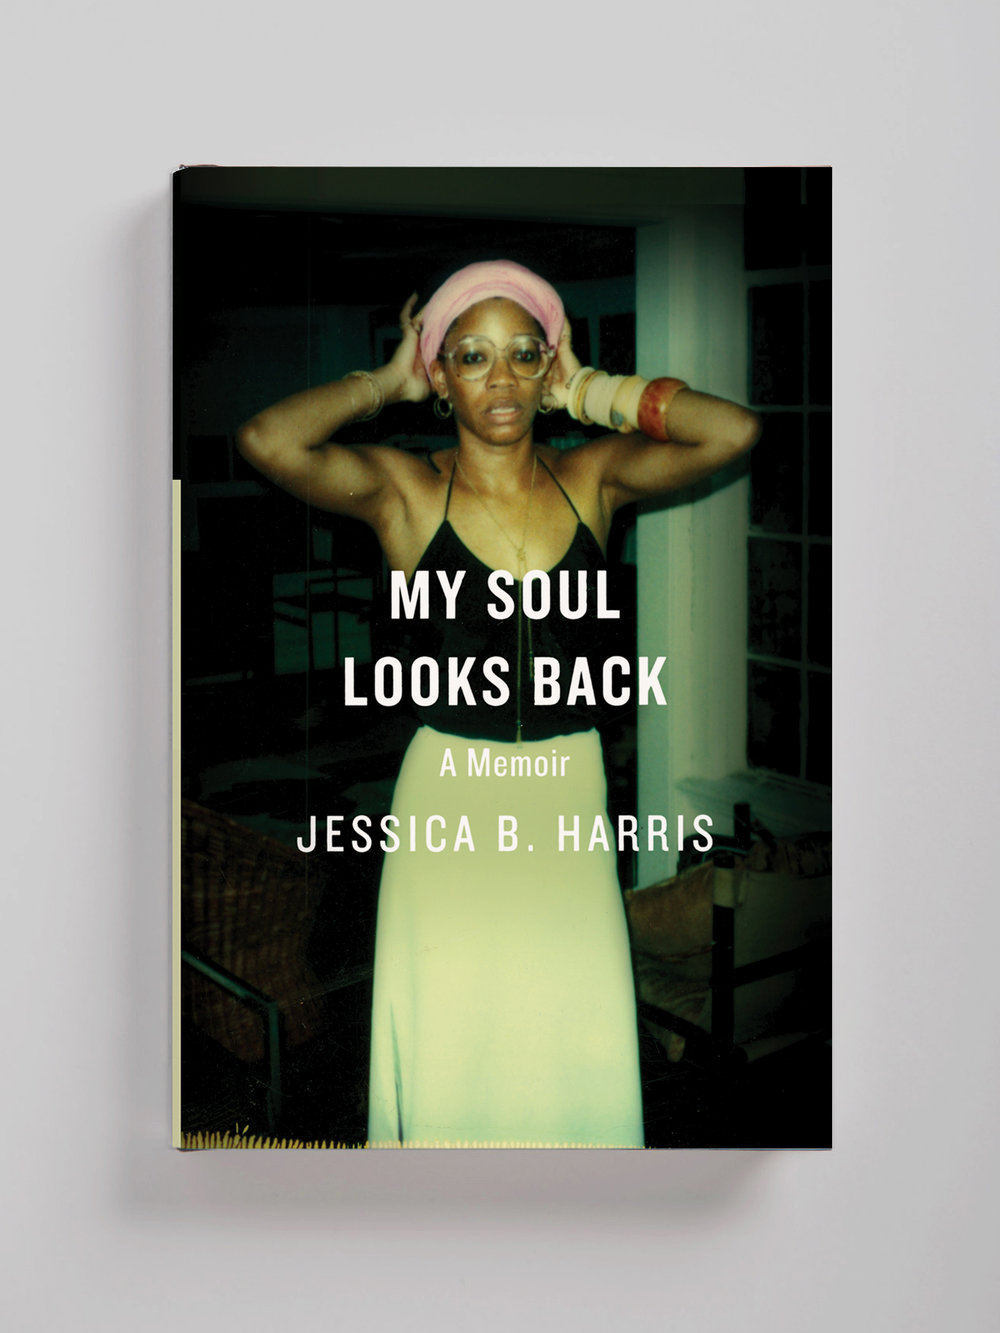 My Soul Looks Back—Jessica B. Harris